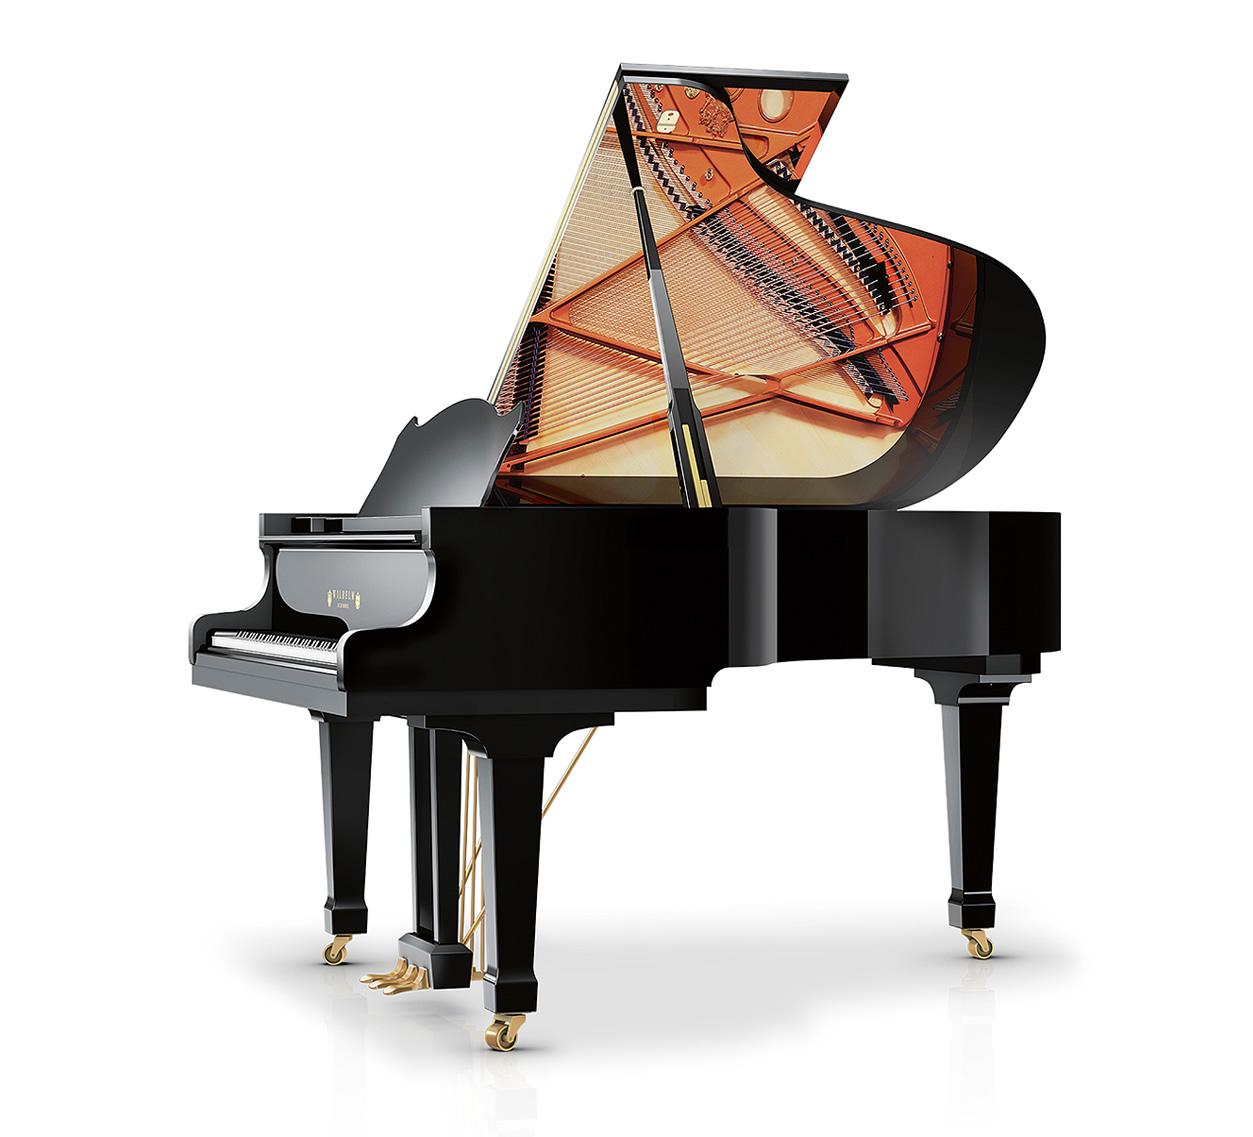 Main Gallery Image: Schimmel Wilhelm piano models.